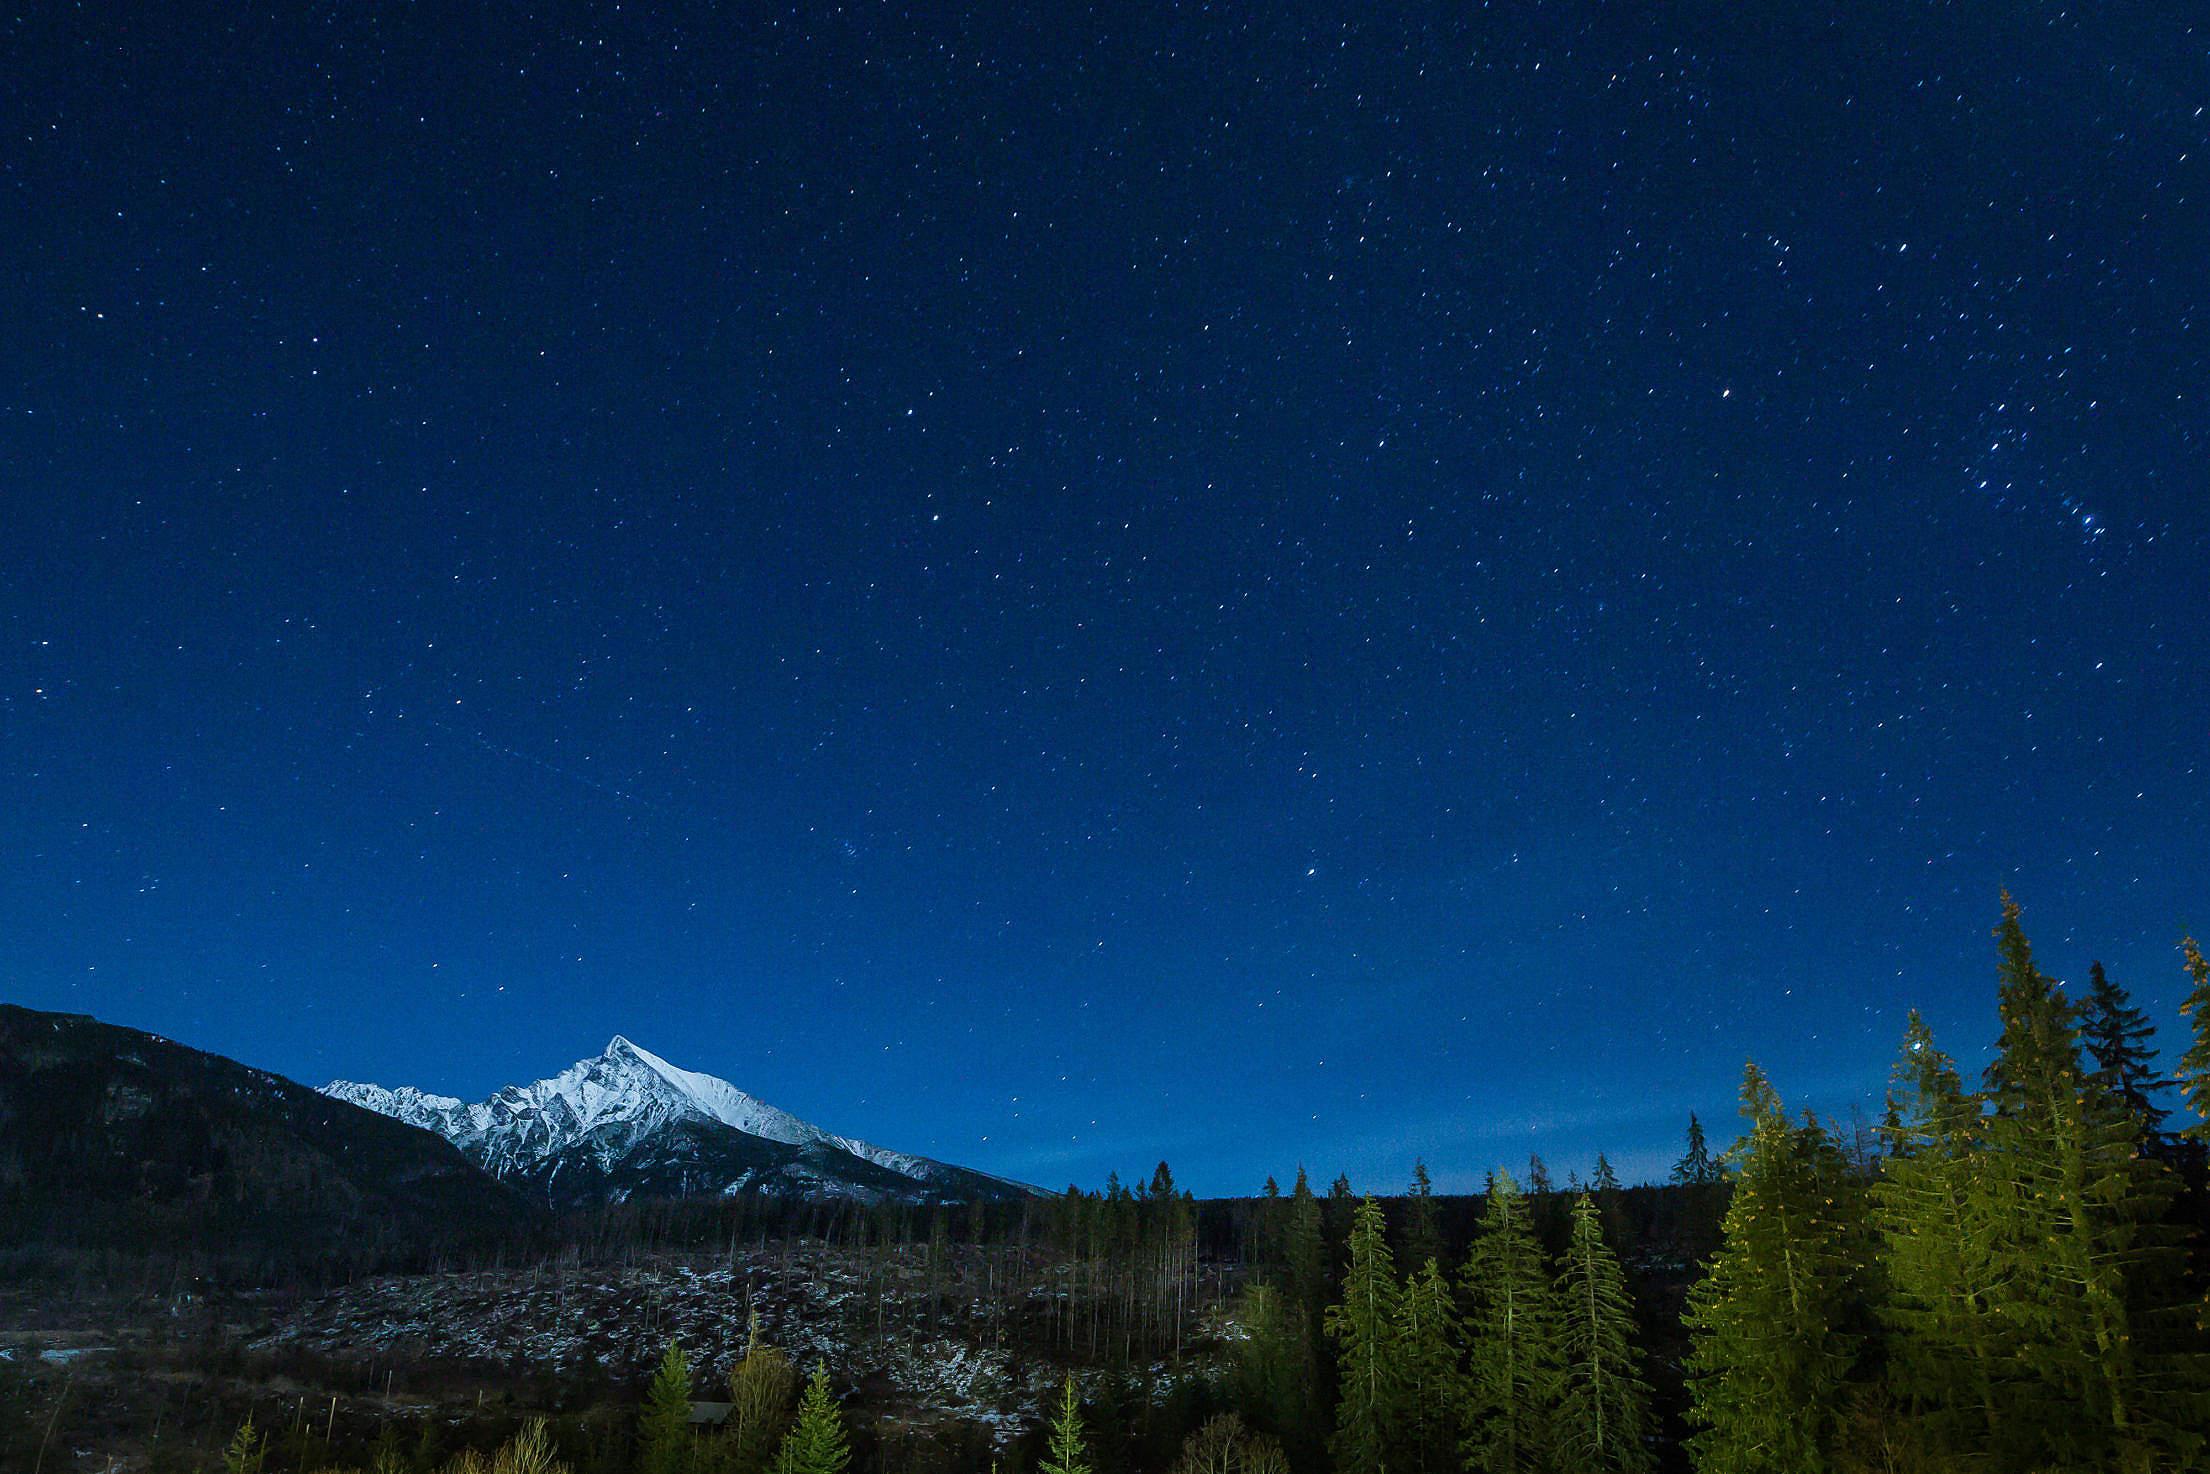 Mountain With Night Sky Full of Stars Free Stock Photo